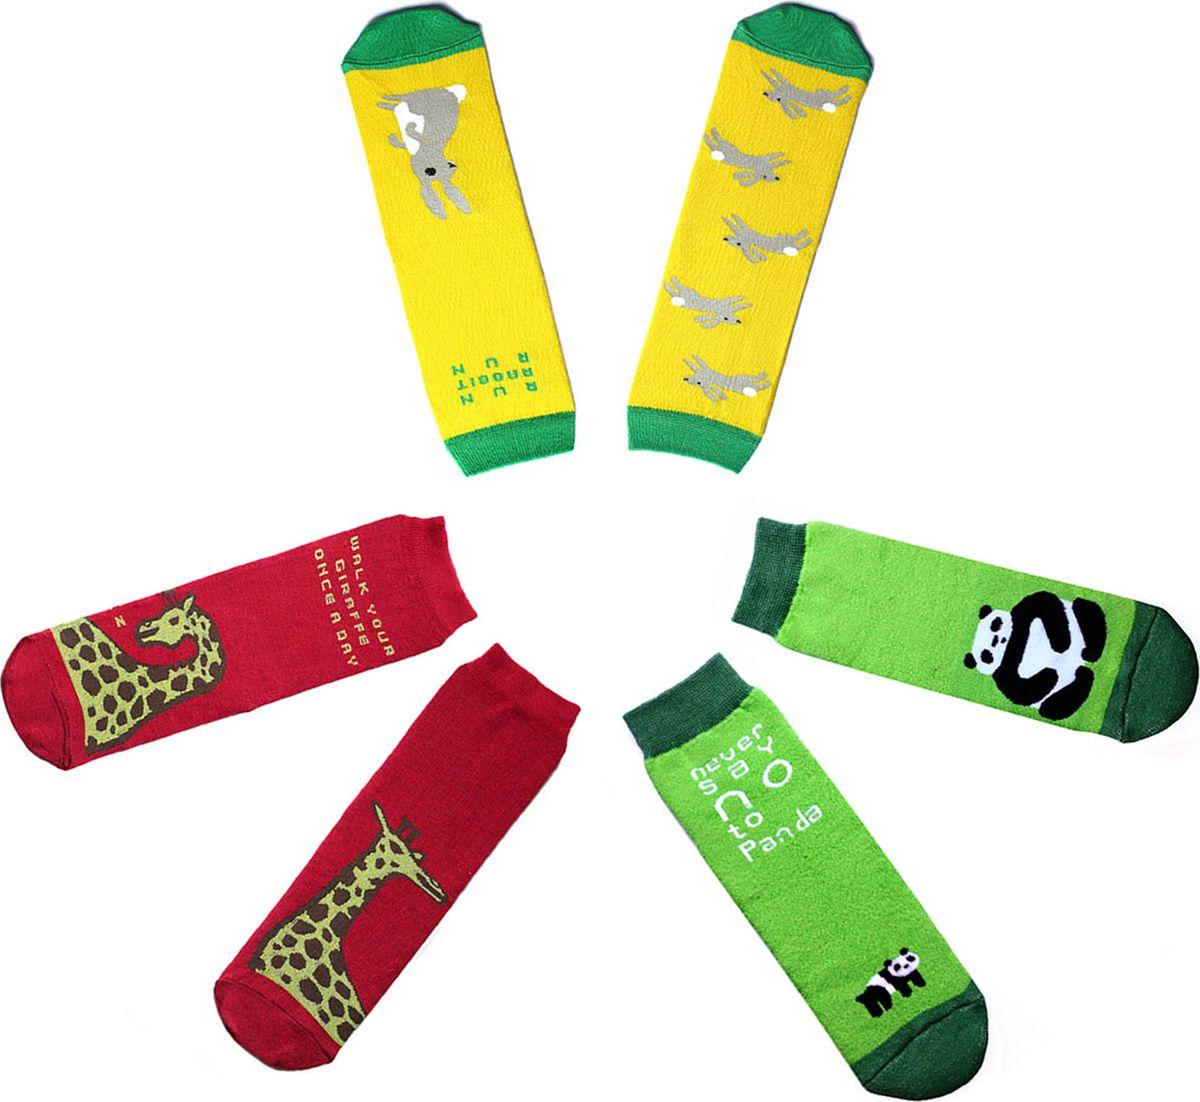 Носки женские Big Bang Socks, цвет: желтый, бордовый, салатовый, 3 пары. p0321. Размер 35-39 носки minecraft socks 3 pack green зеленые s 3 пары 11750